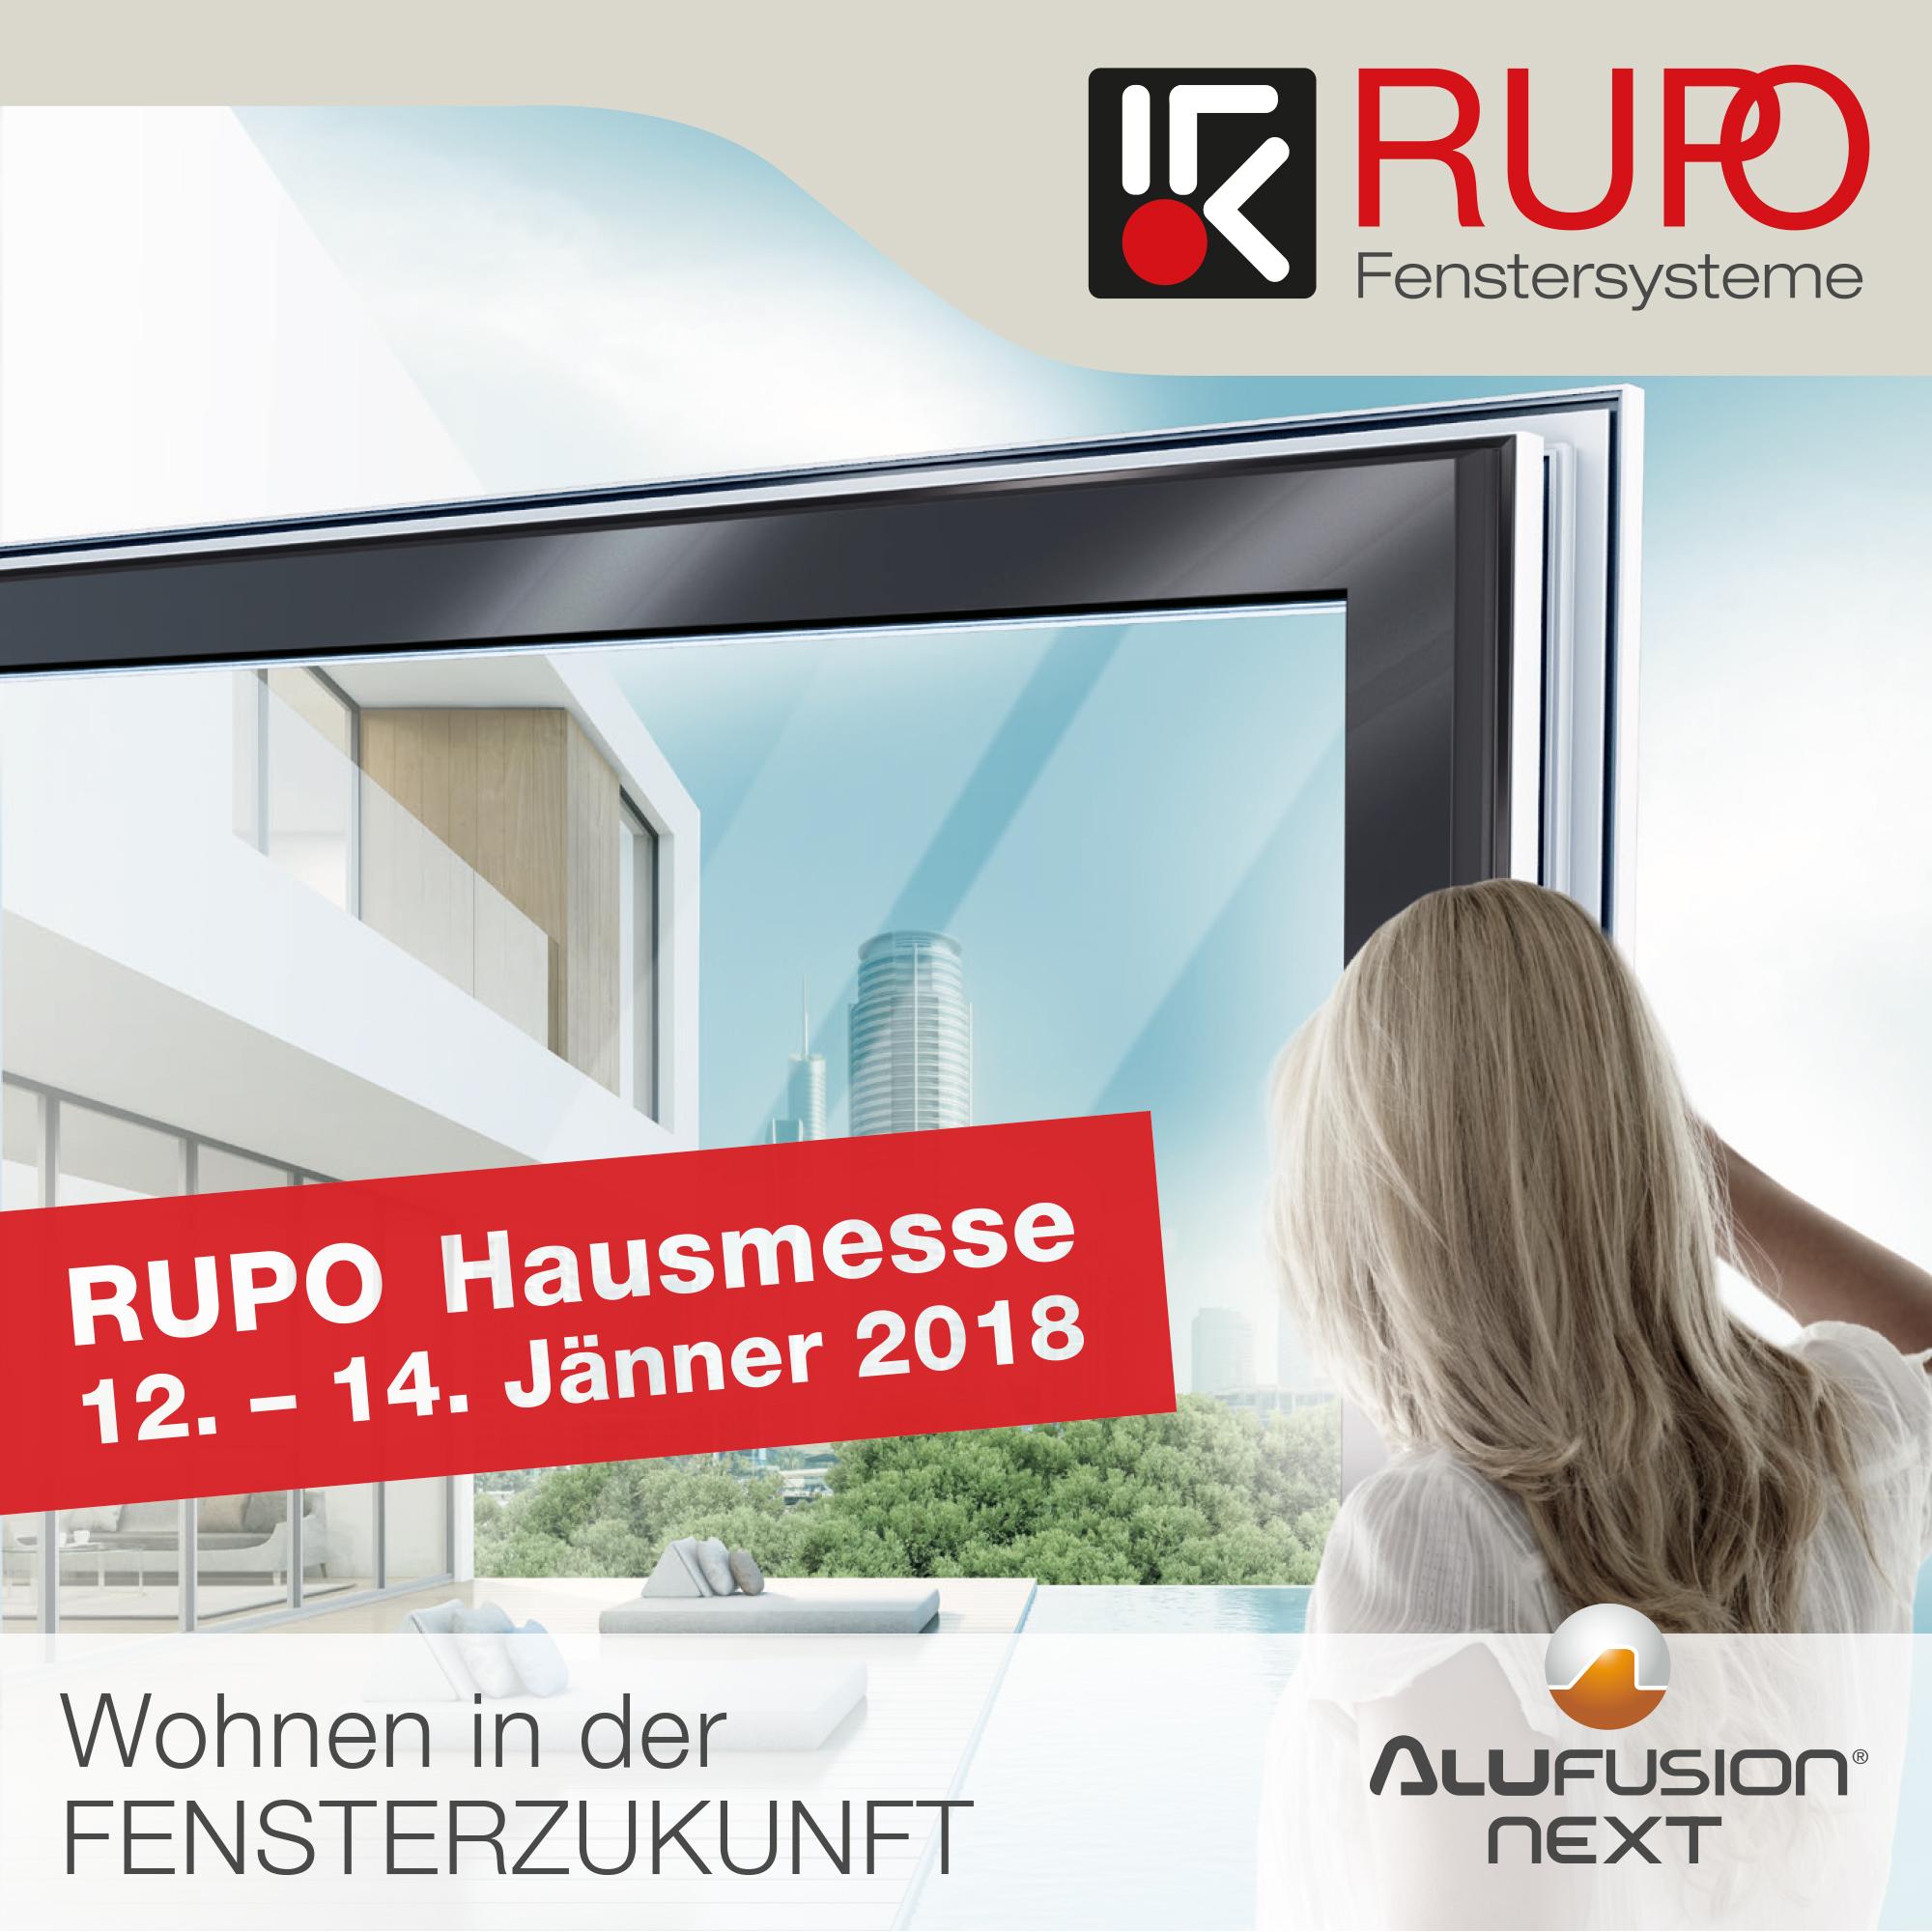 RUPO Hausmesse 2018